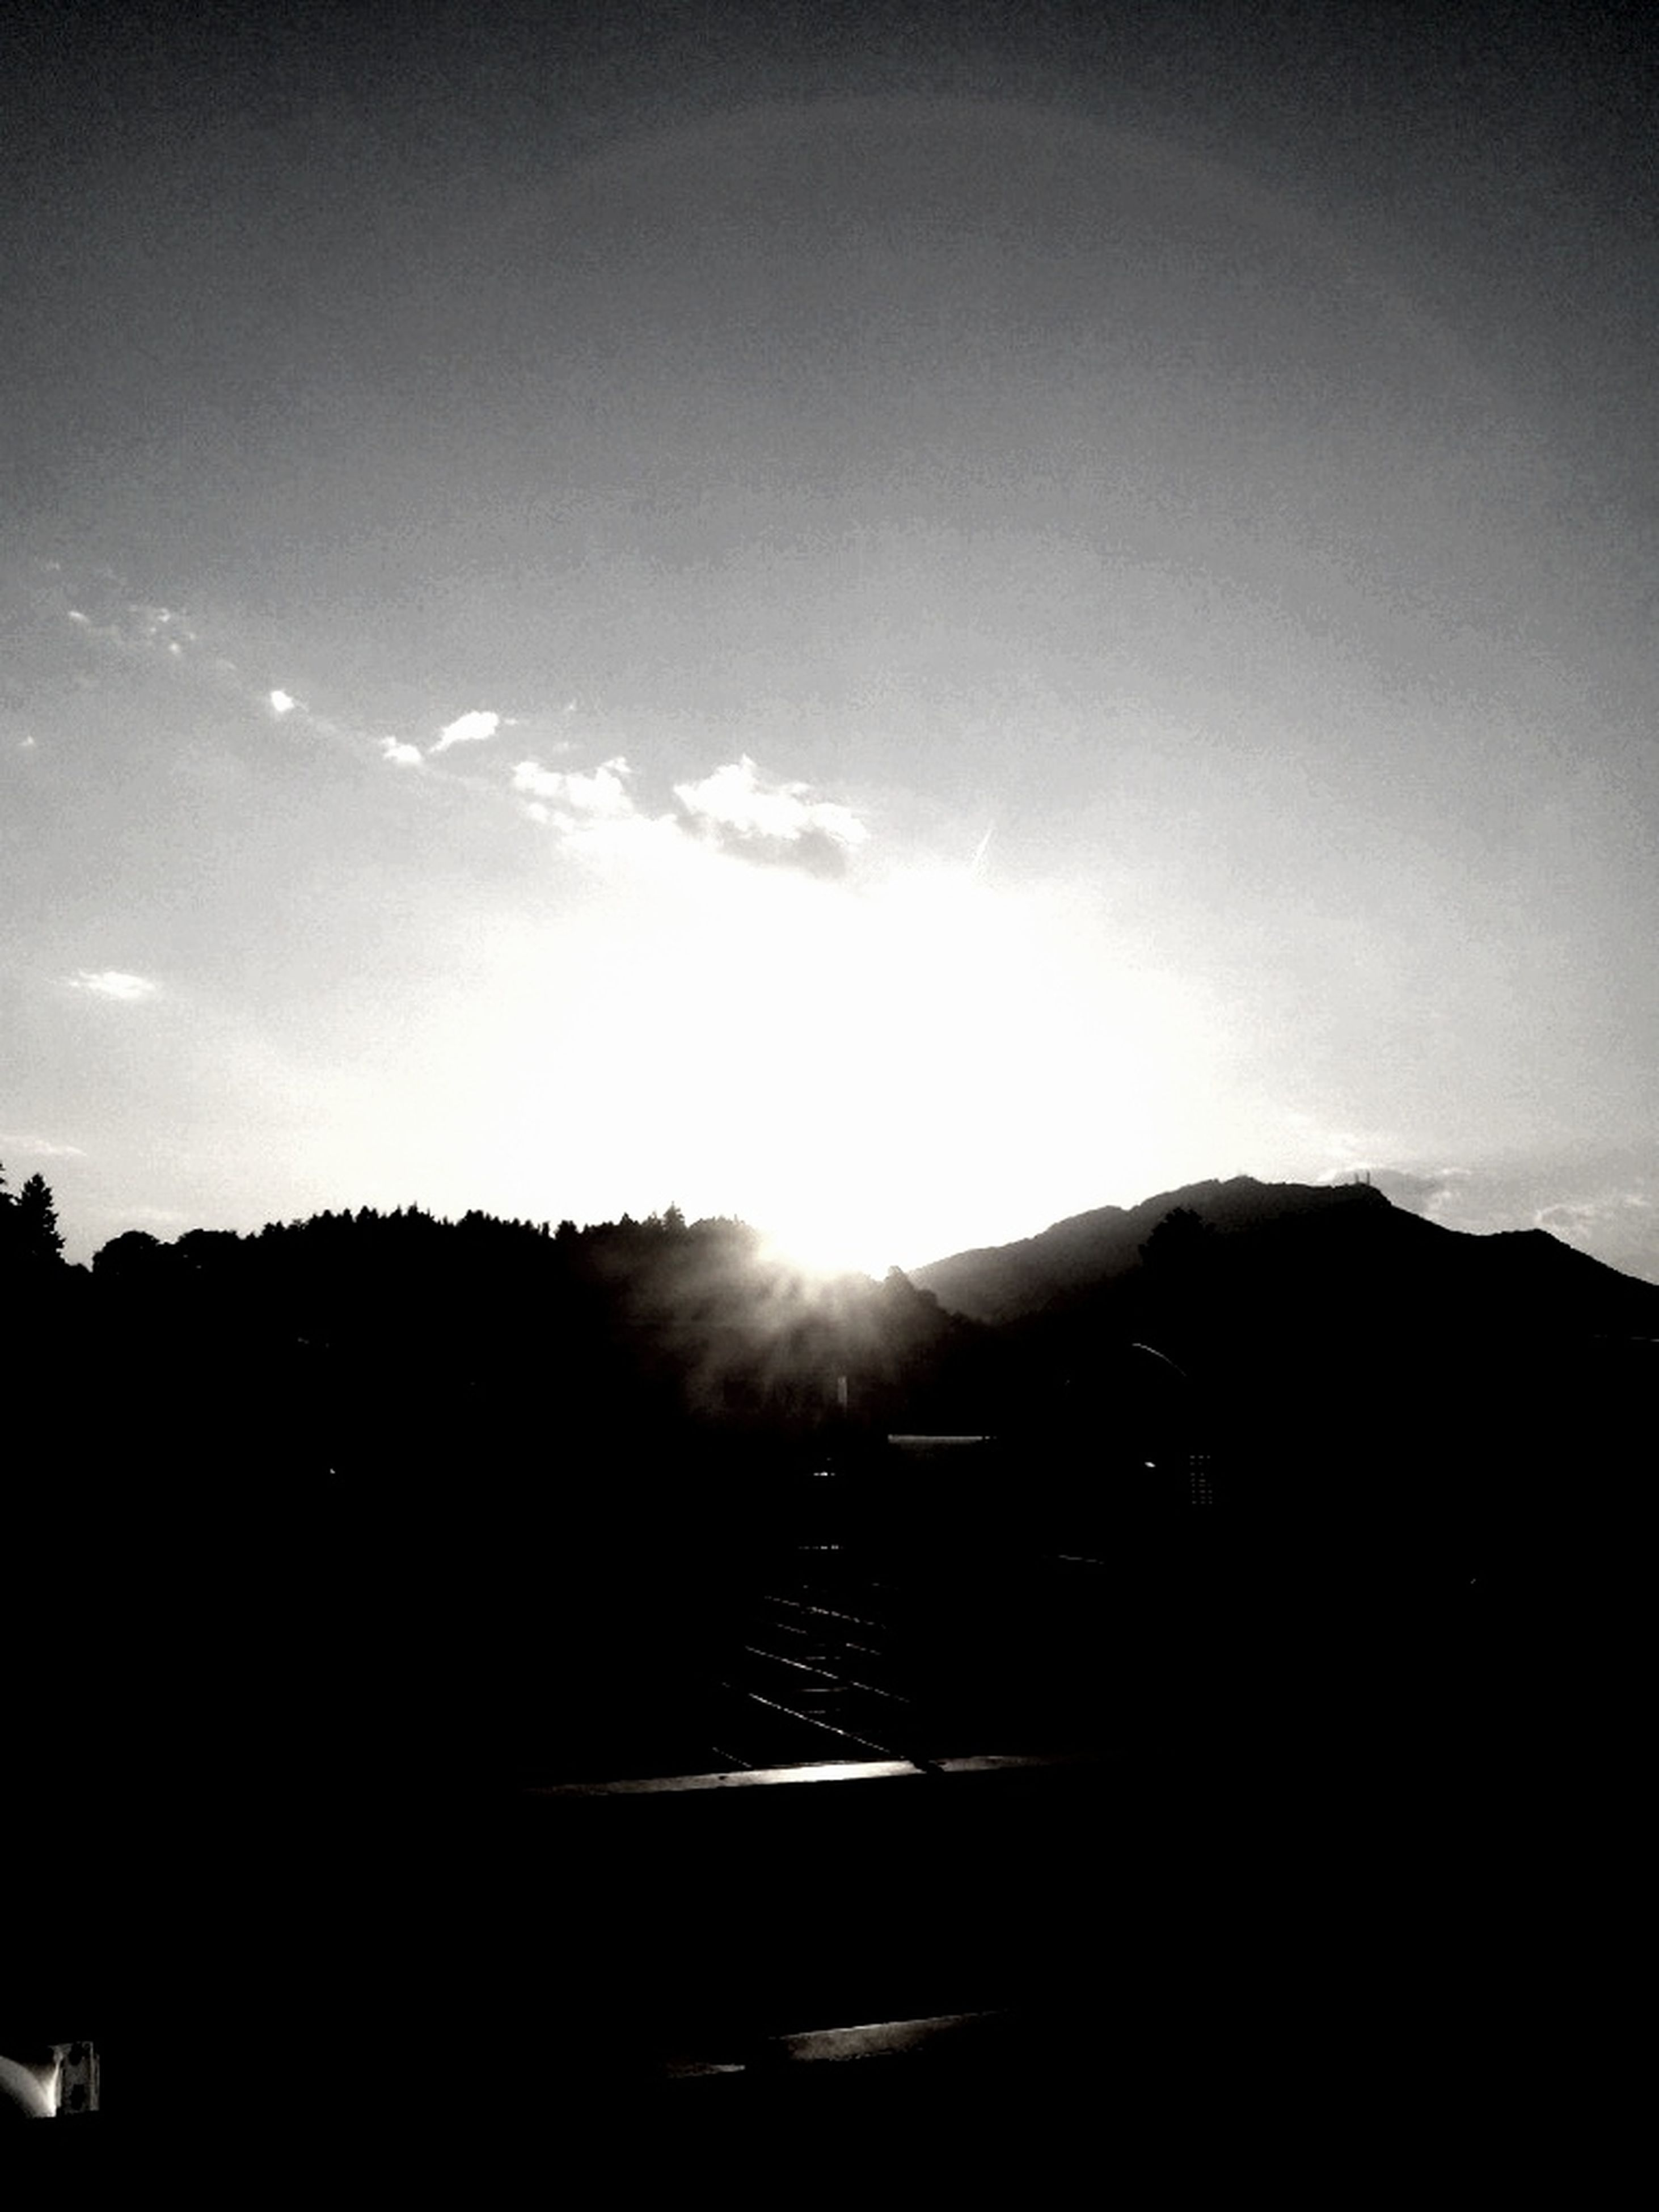 silhouette, sun, mountain, sky, sunbeam, sunlight, scenics, tranquility, tranquil scene, beauty in nature, lens flare, nature, mountain range, cloud - sky, landscape, sunset, cloud, outdoors, idyllic, copy space